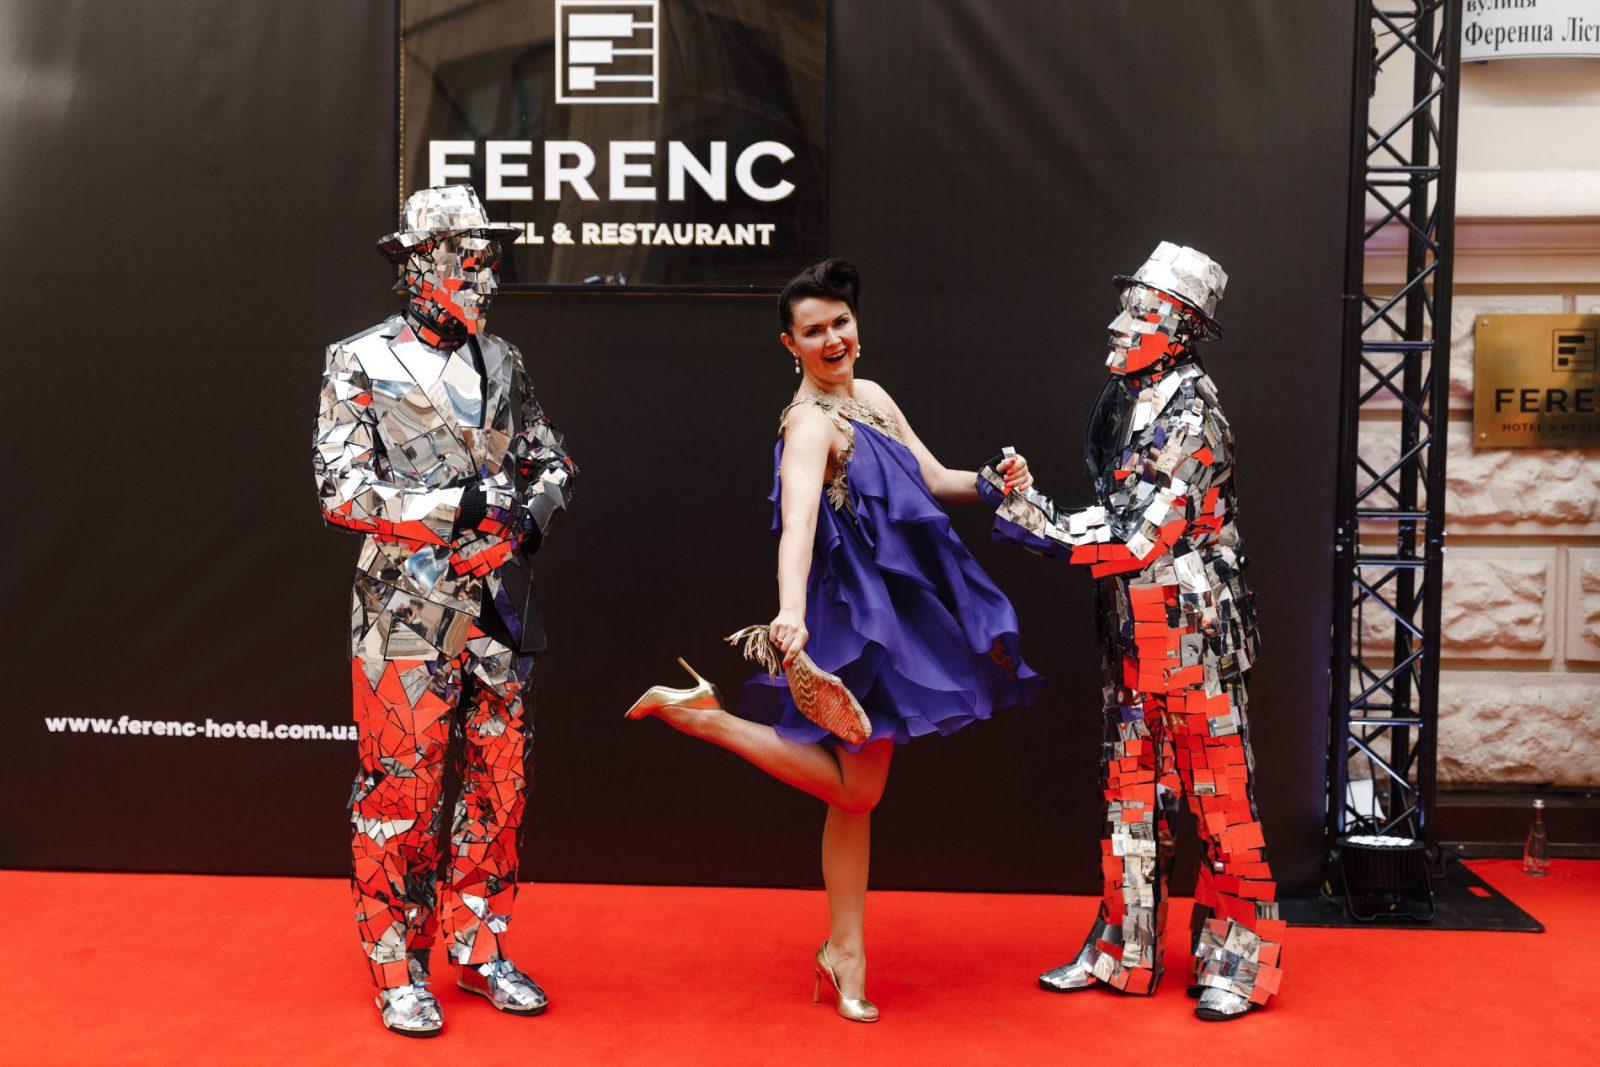 Ferenc0055